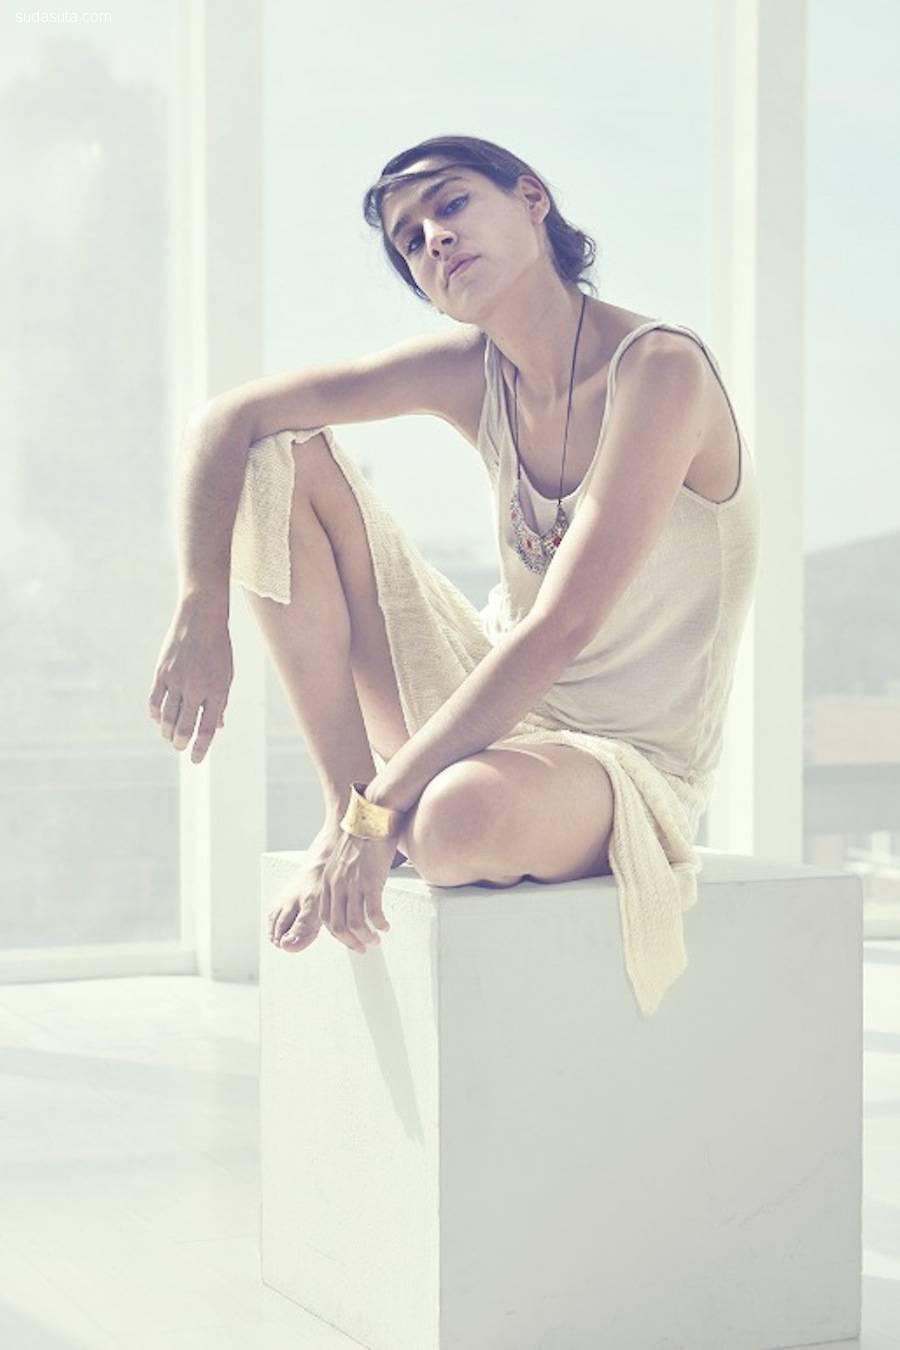 Gartzen Martinez Sagarna 舞蹈摄影欣赏